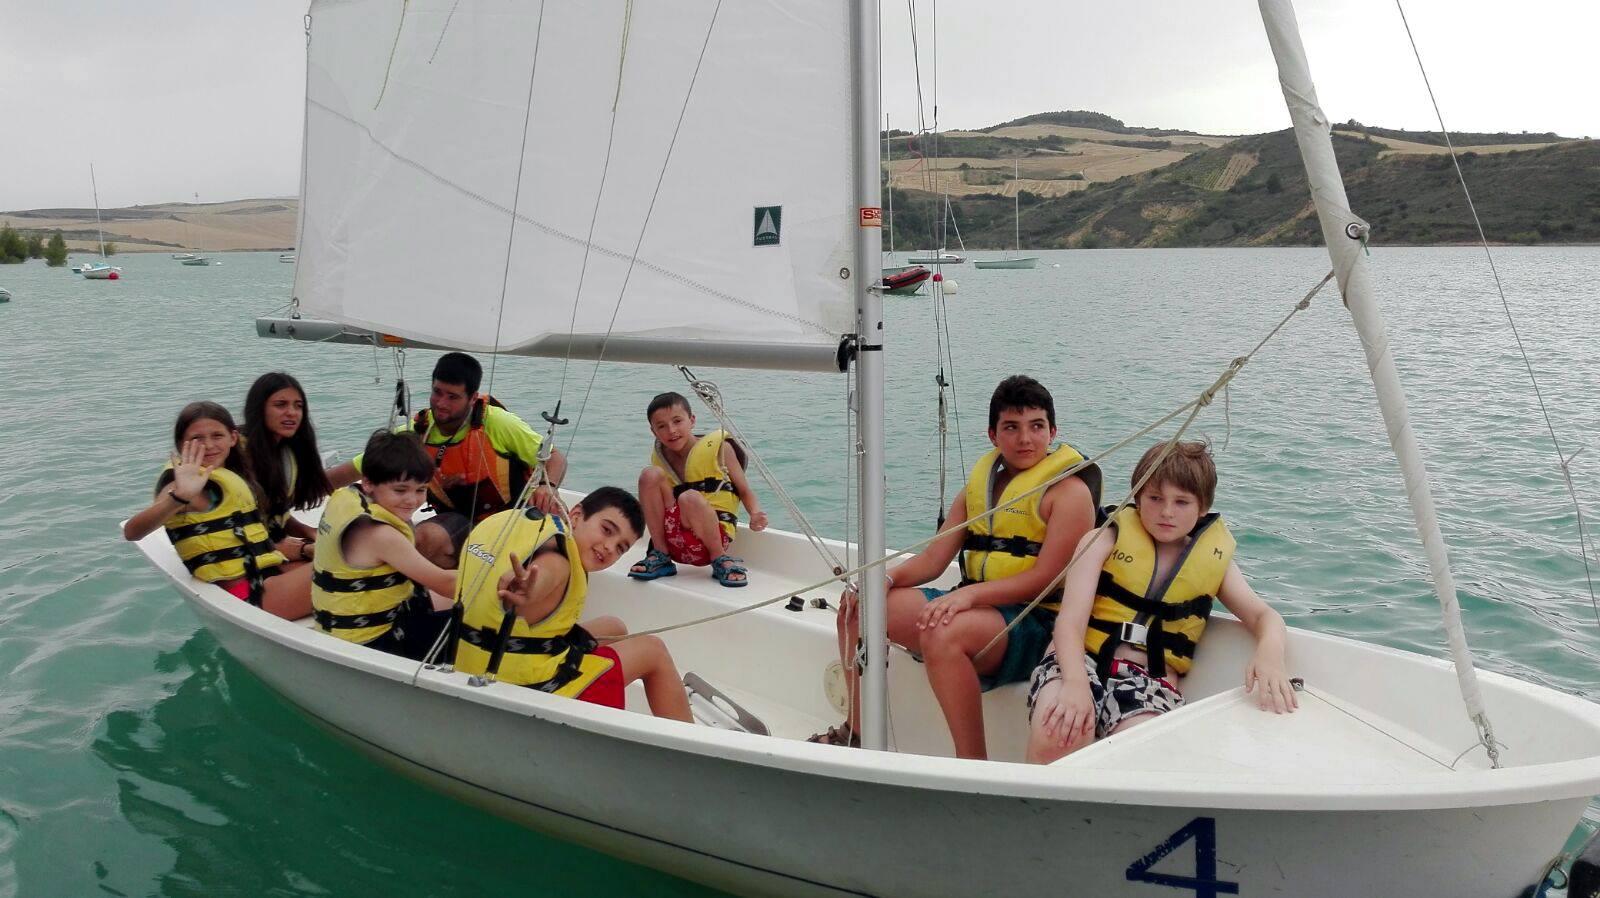 Campamentos de verano en España con vela